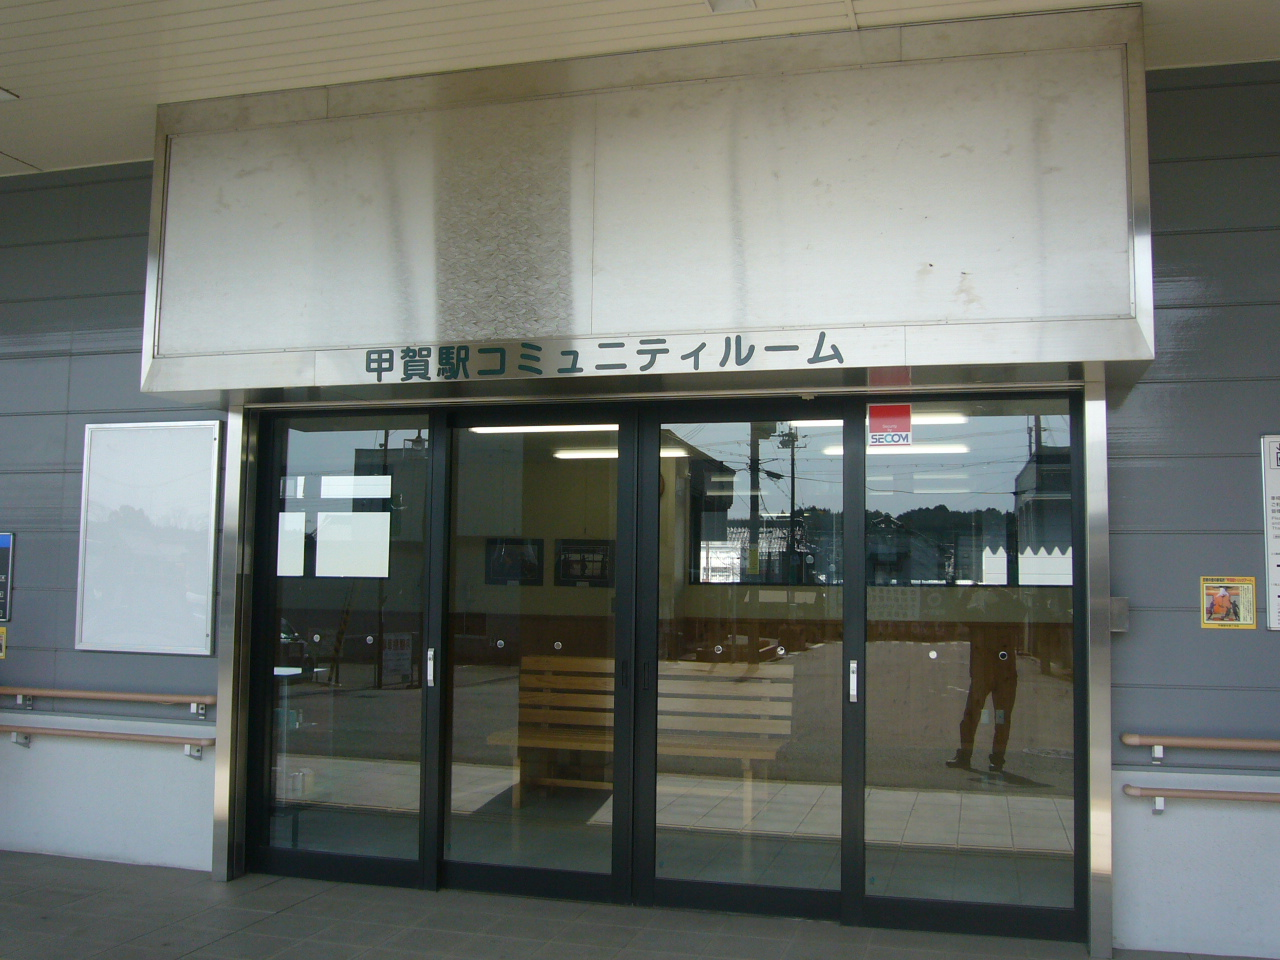 p1140577.JPG